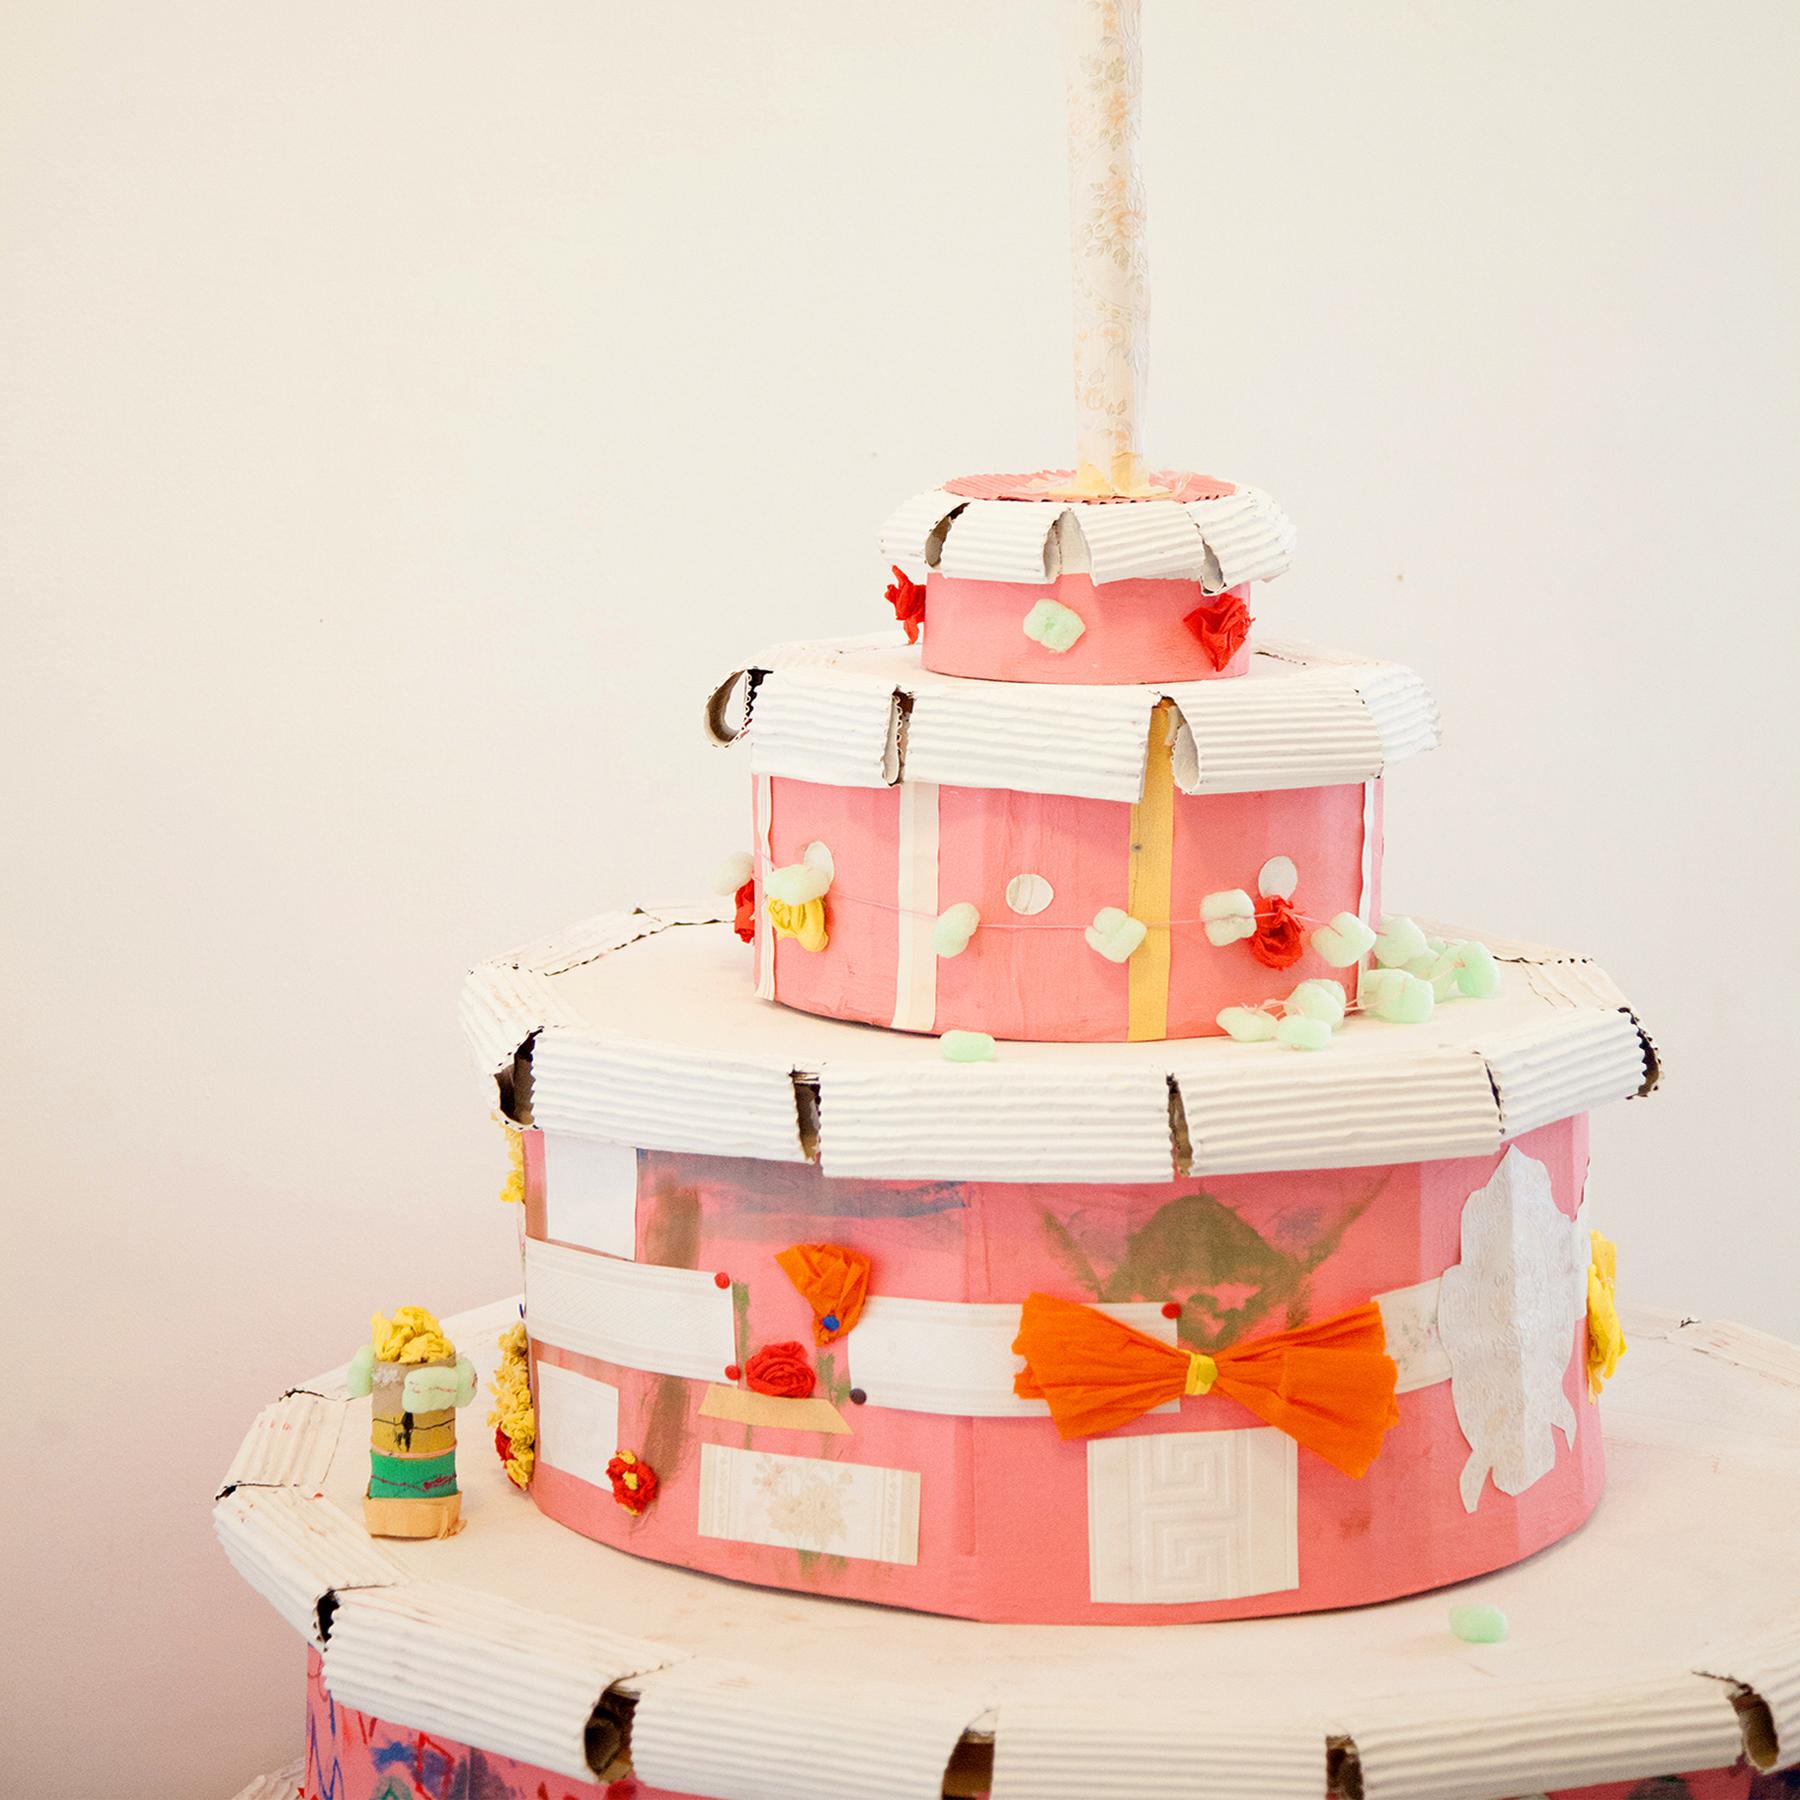 Torte © Foto: Eva Mühlbacher, 2014